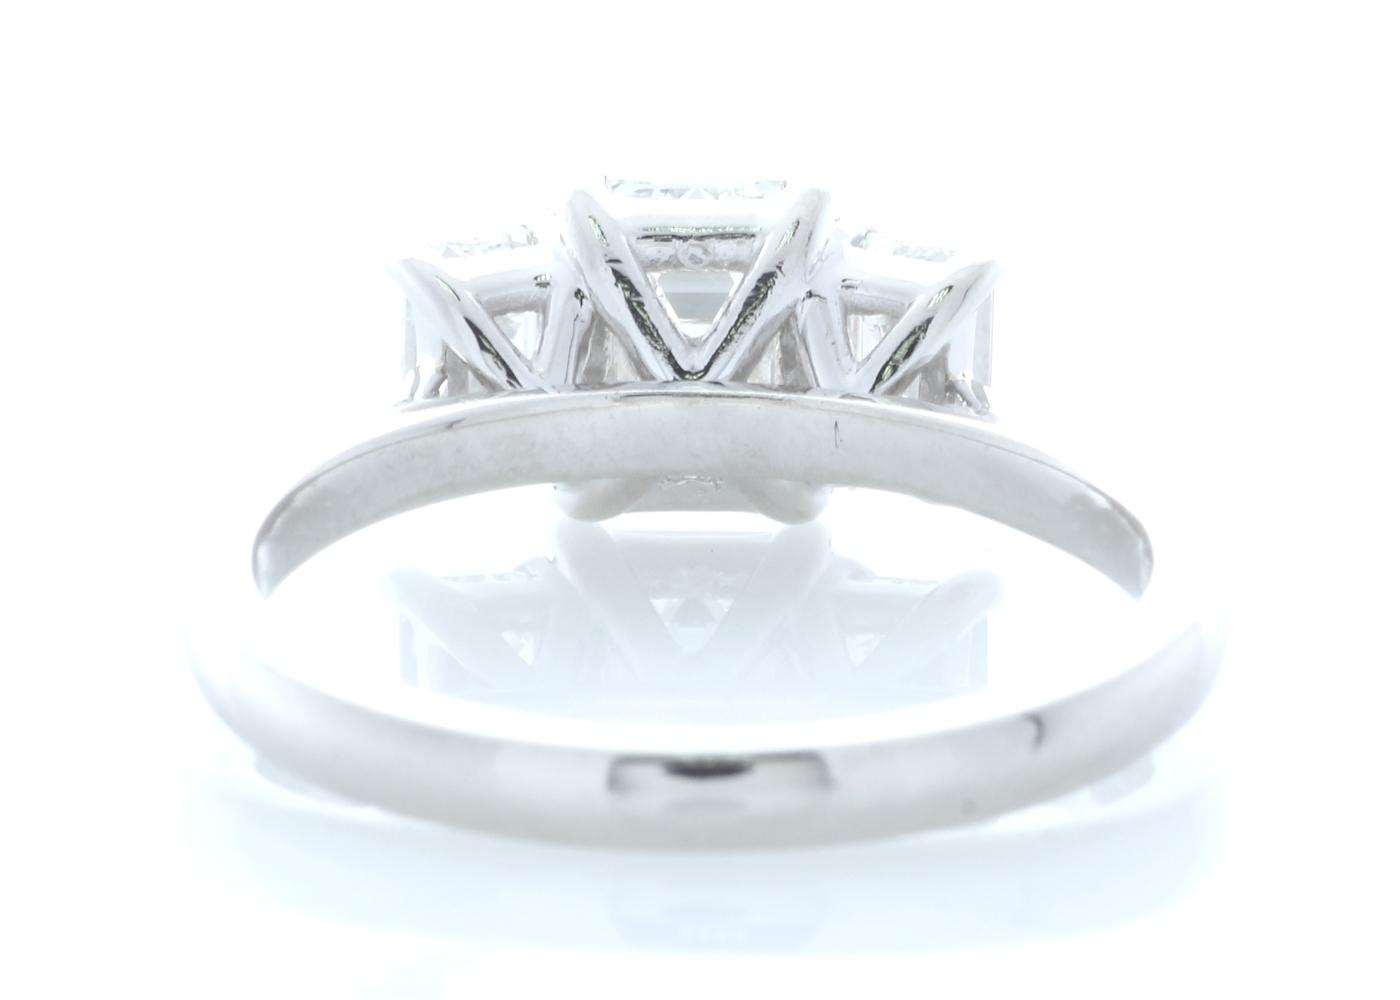 Platinum Three Stone Claw Set Diamond Ring 1.91 Carats - Image 3 of 4